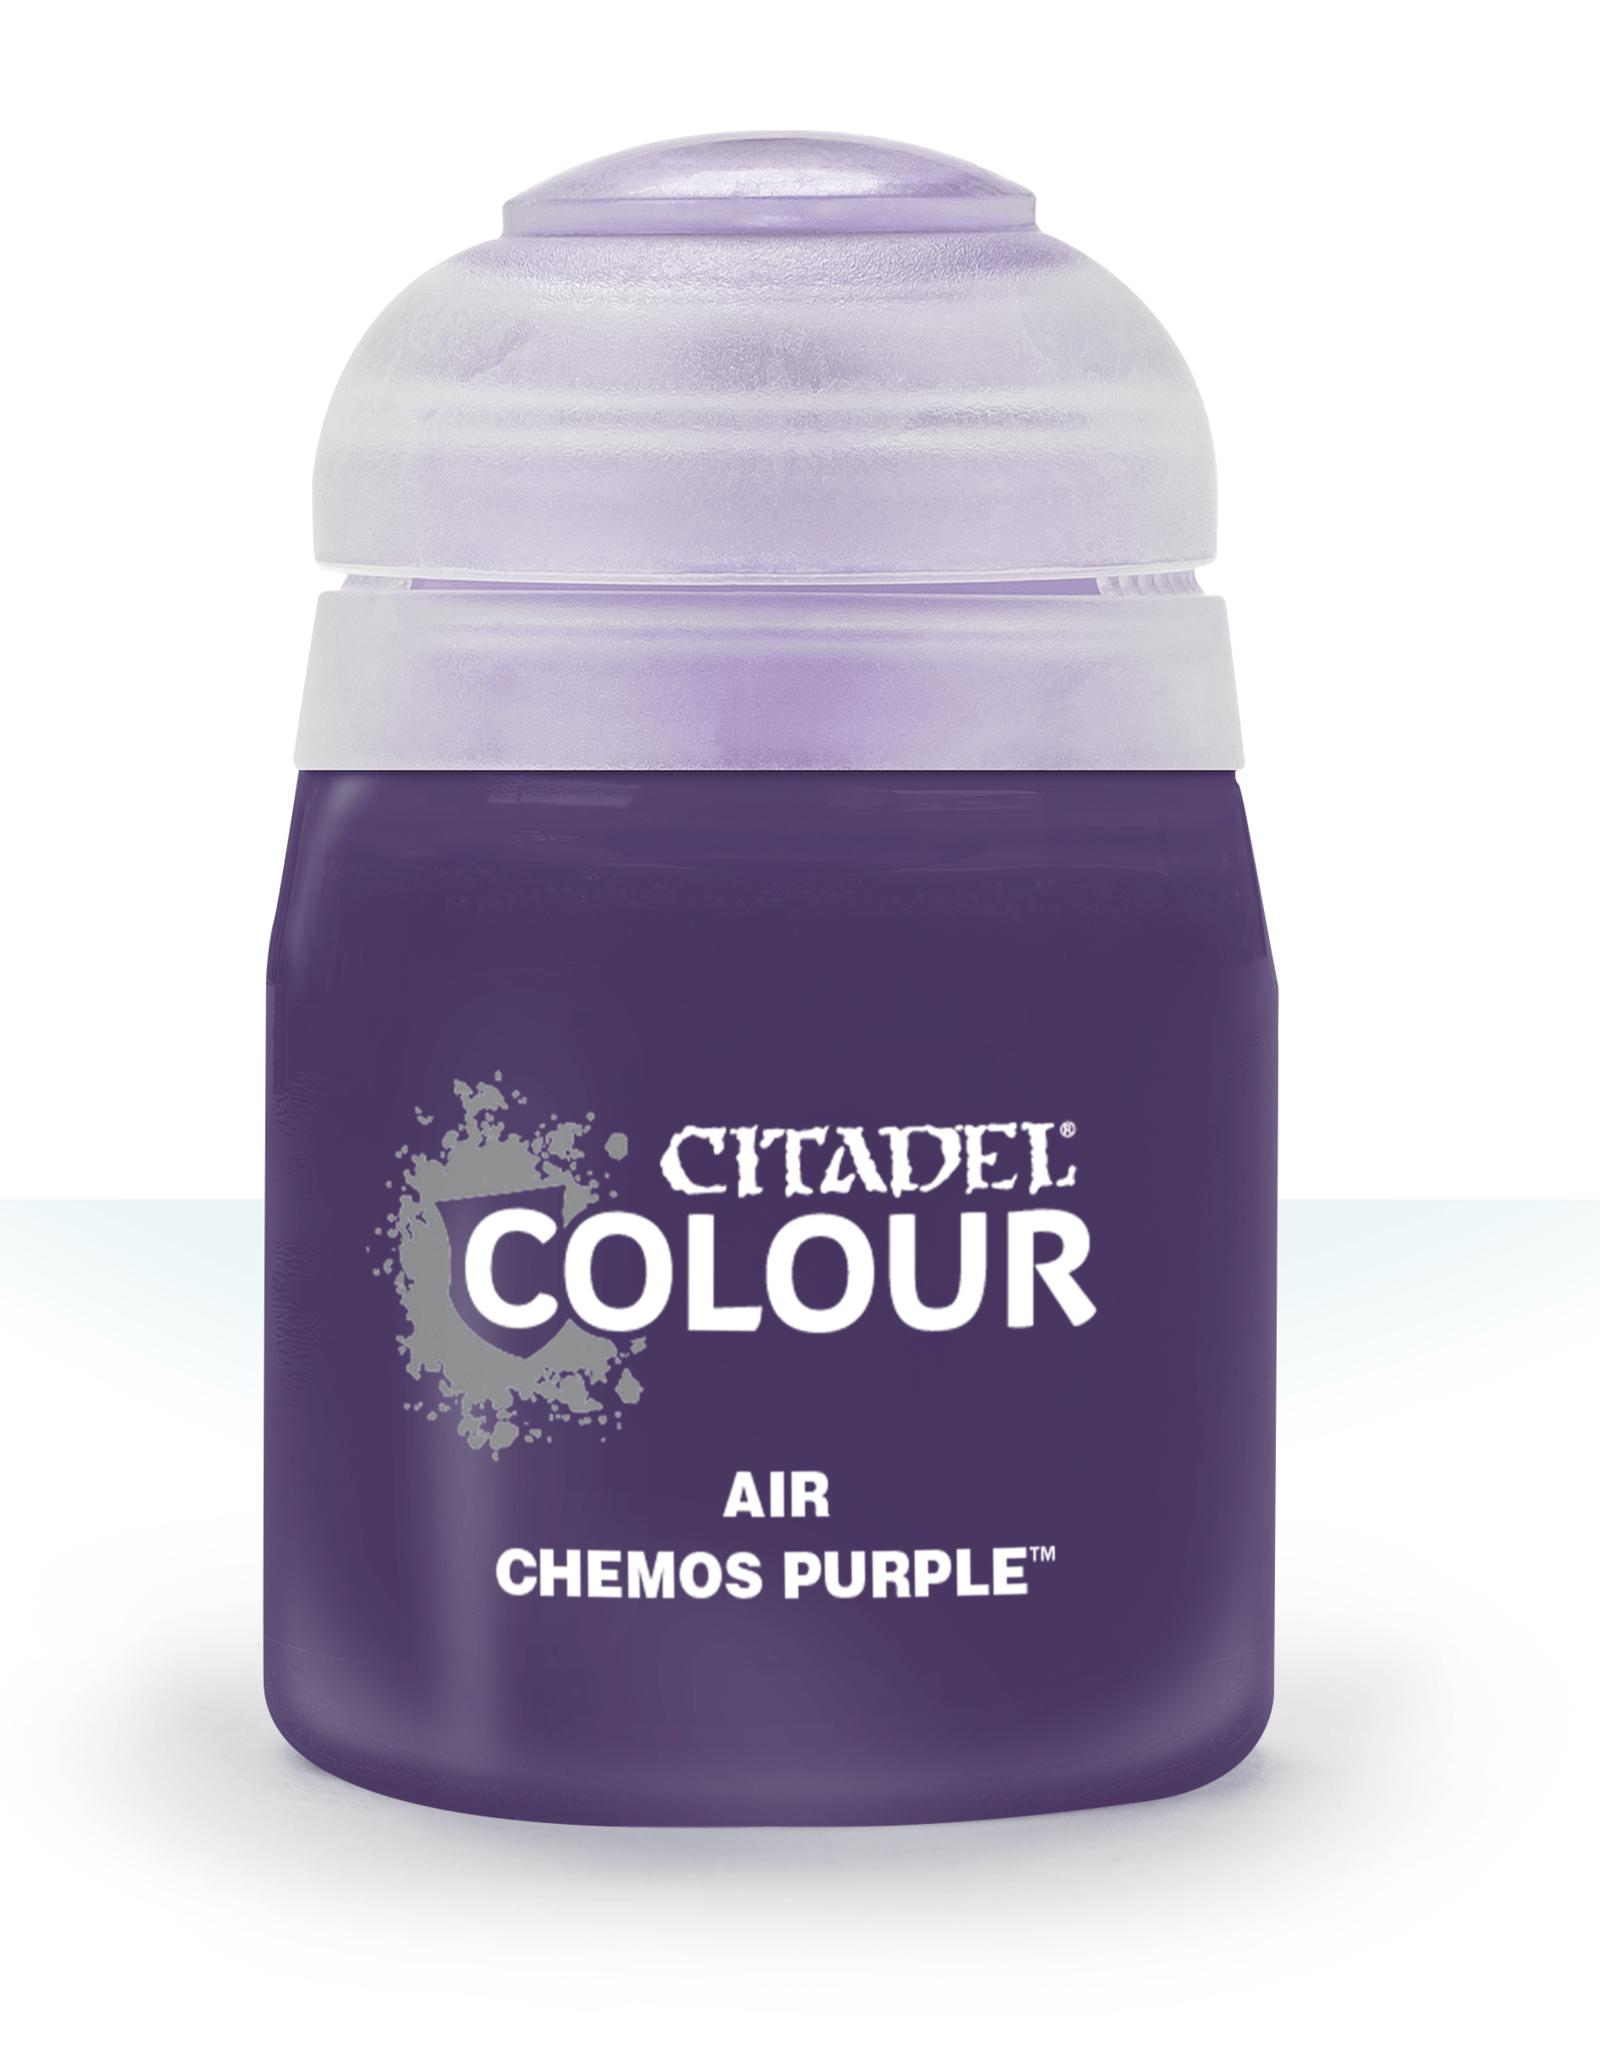 Citadel Citadel Air: Chemos Purple (24ml)